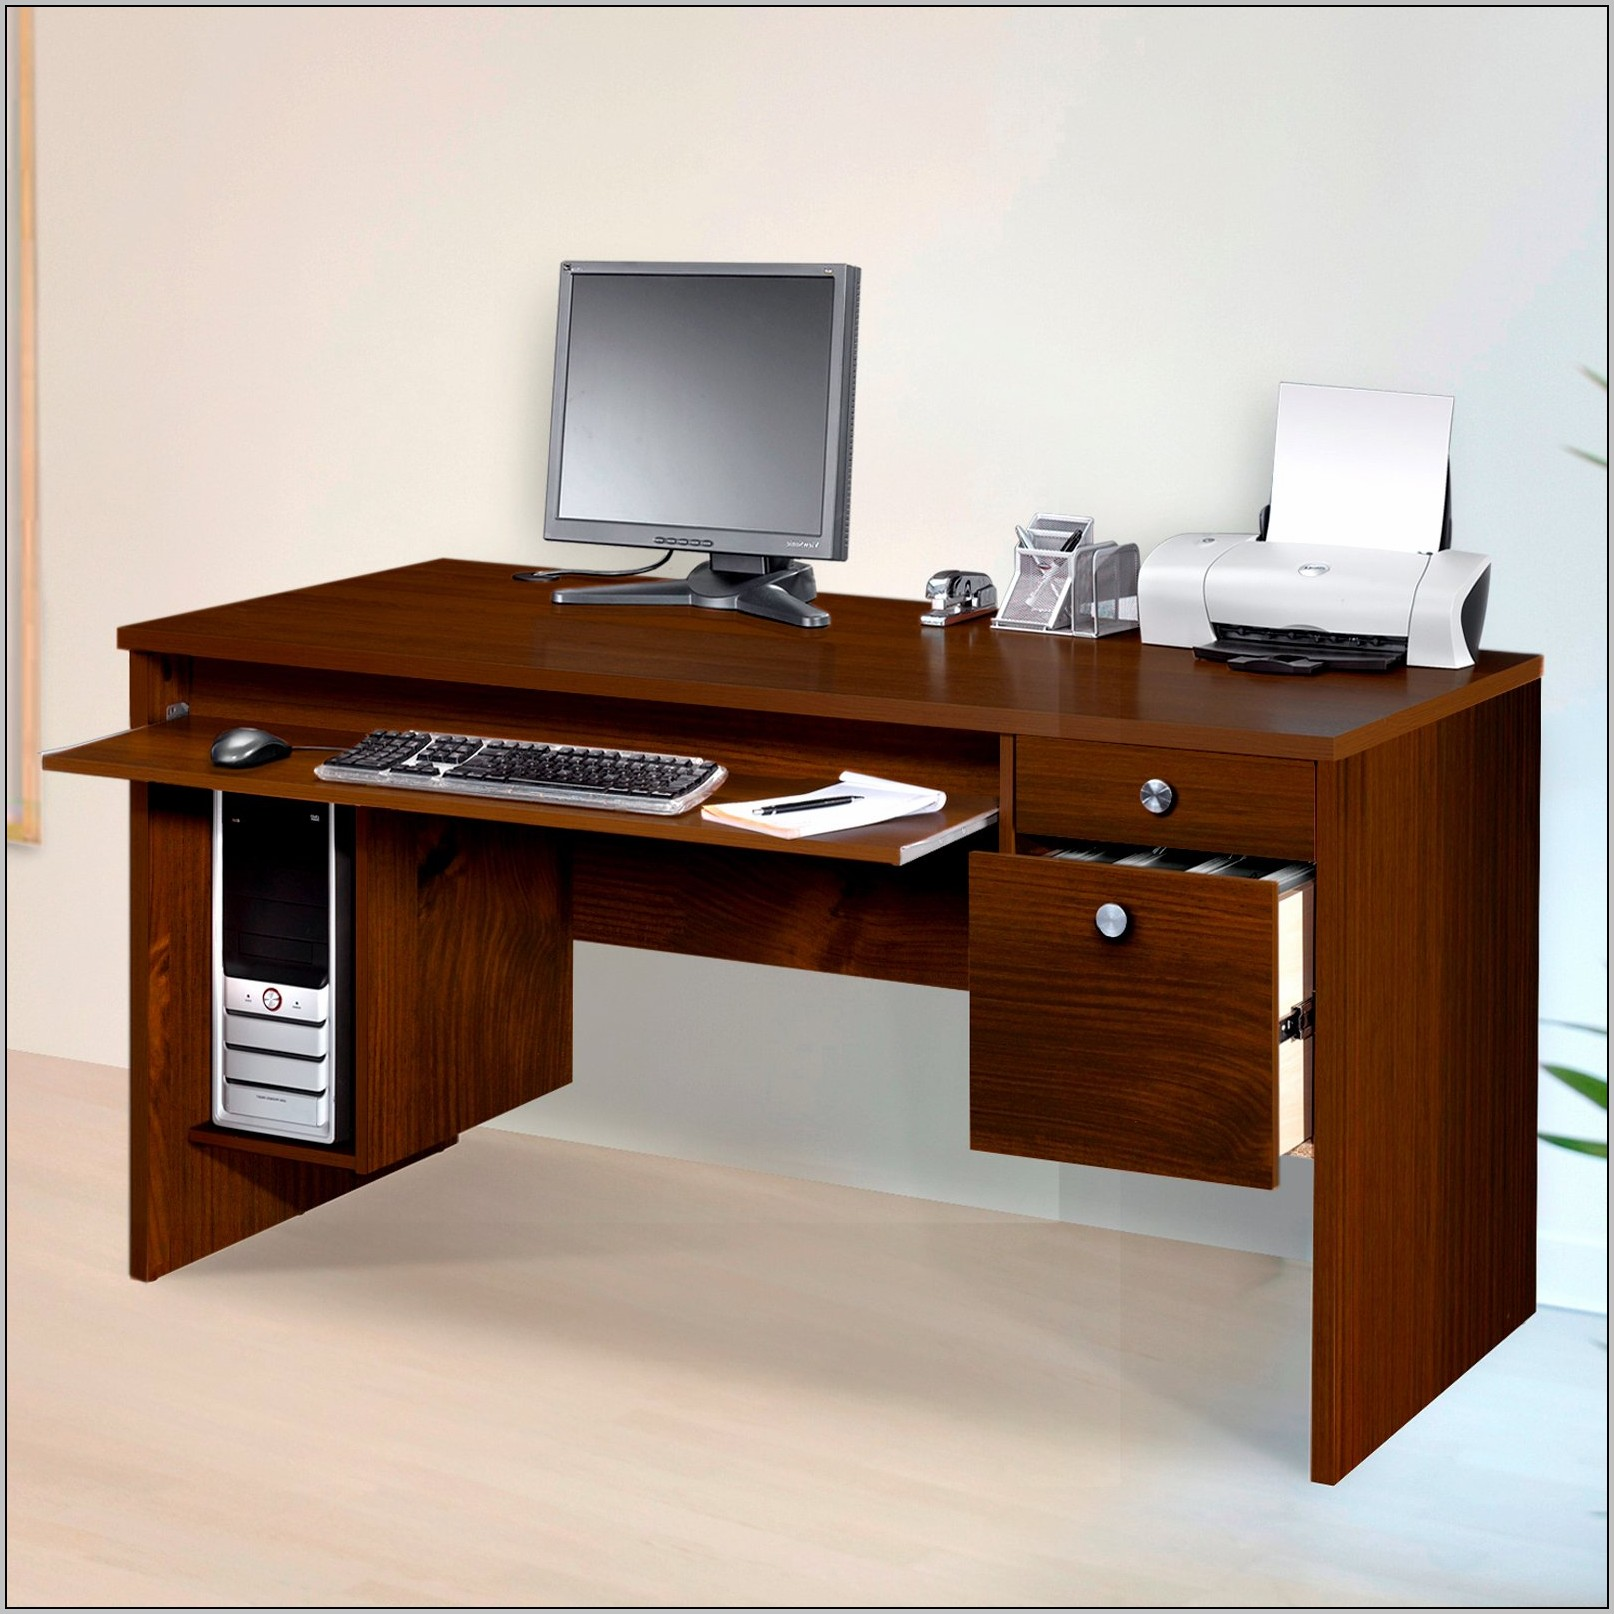 Corner Desk With File Drawers  Desk  Home Design Ideas